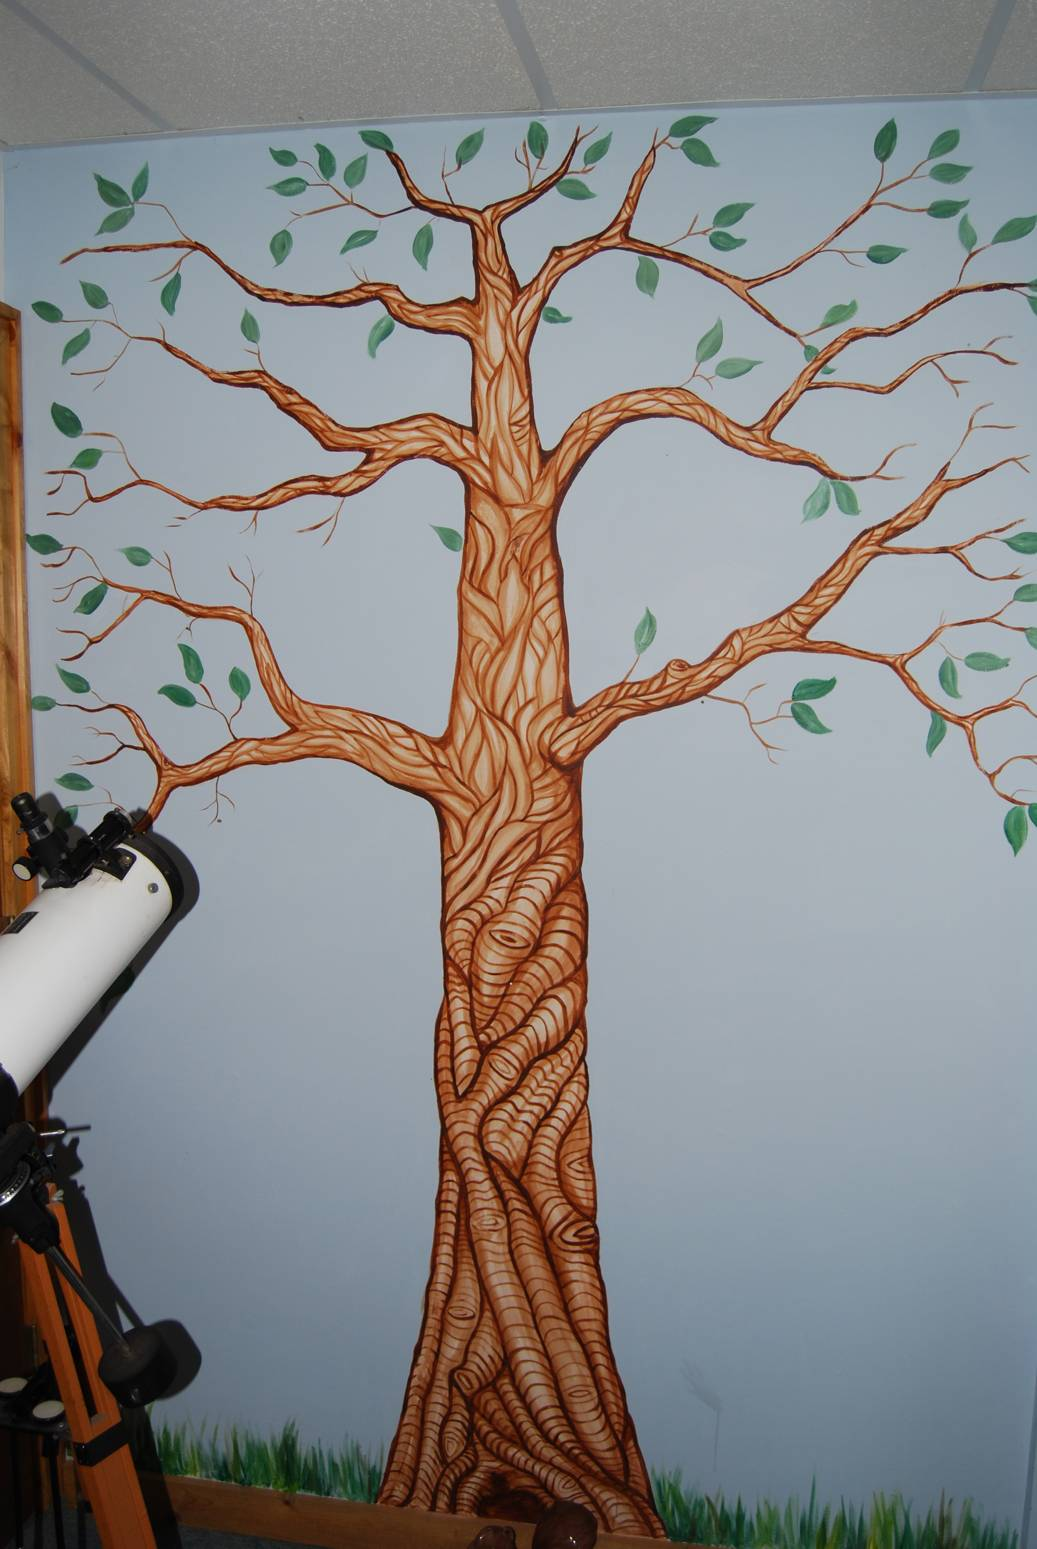 tradart custom artwork - tree mural